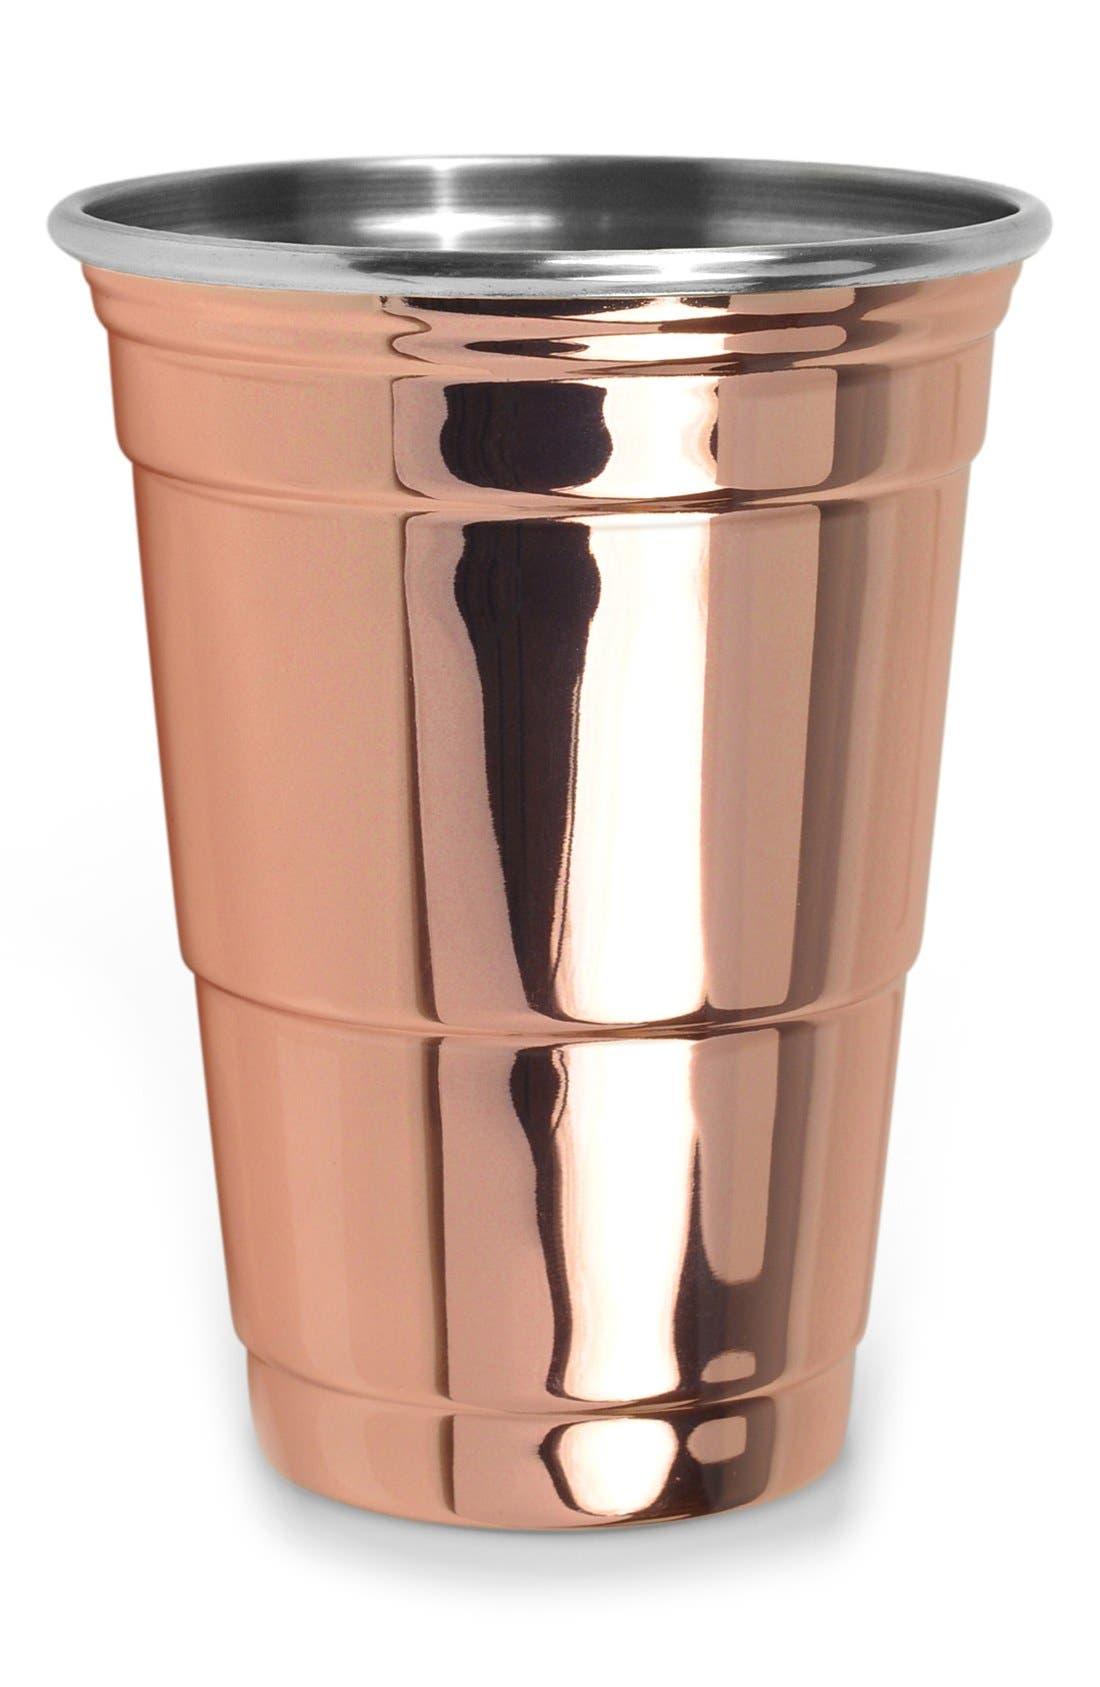 Copper Party Cup,                             Main thumbnail 1, color,                             Metallic Rust/ Copper